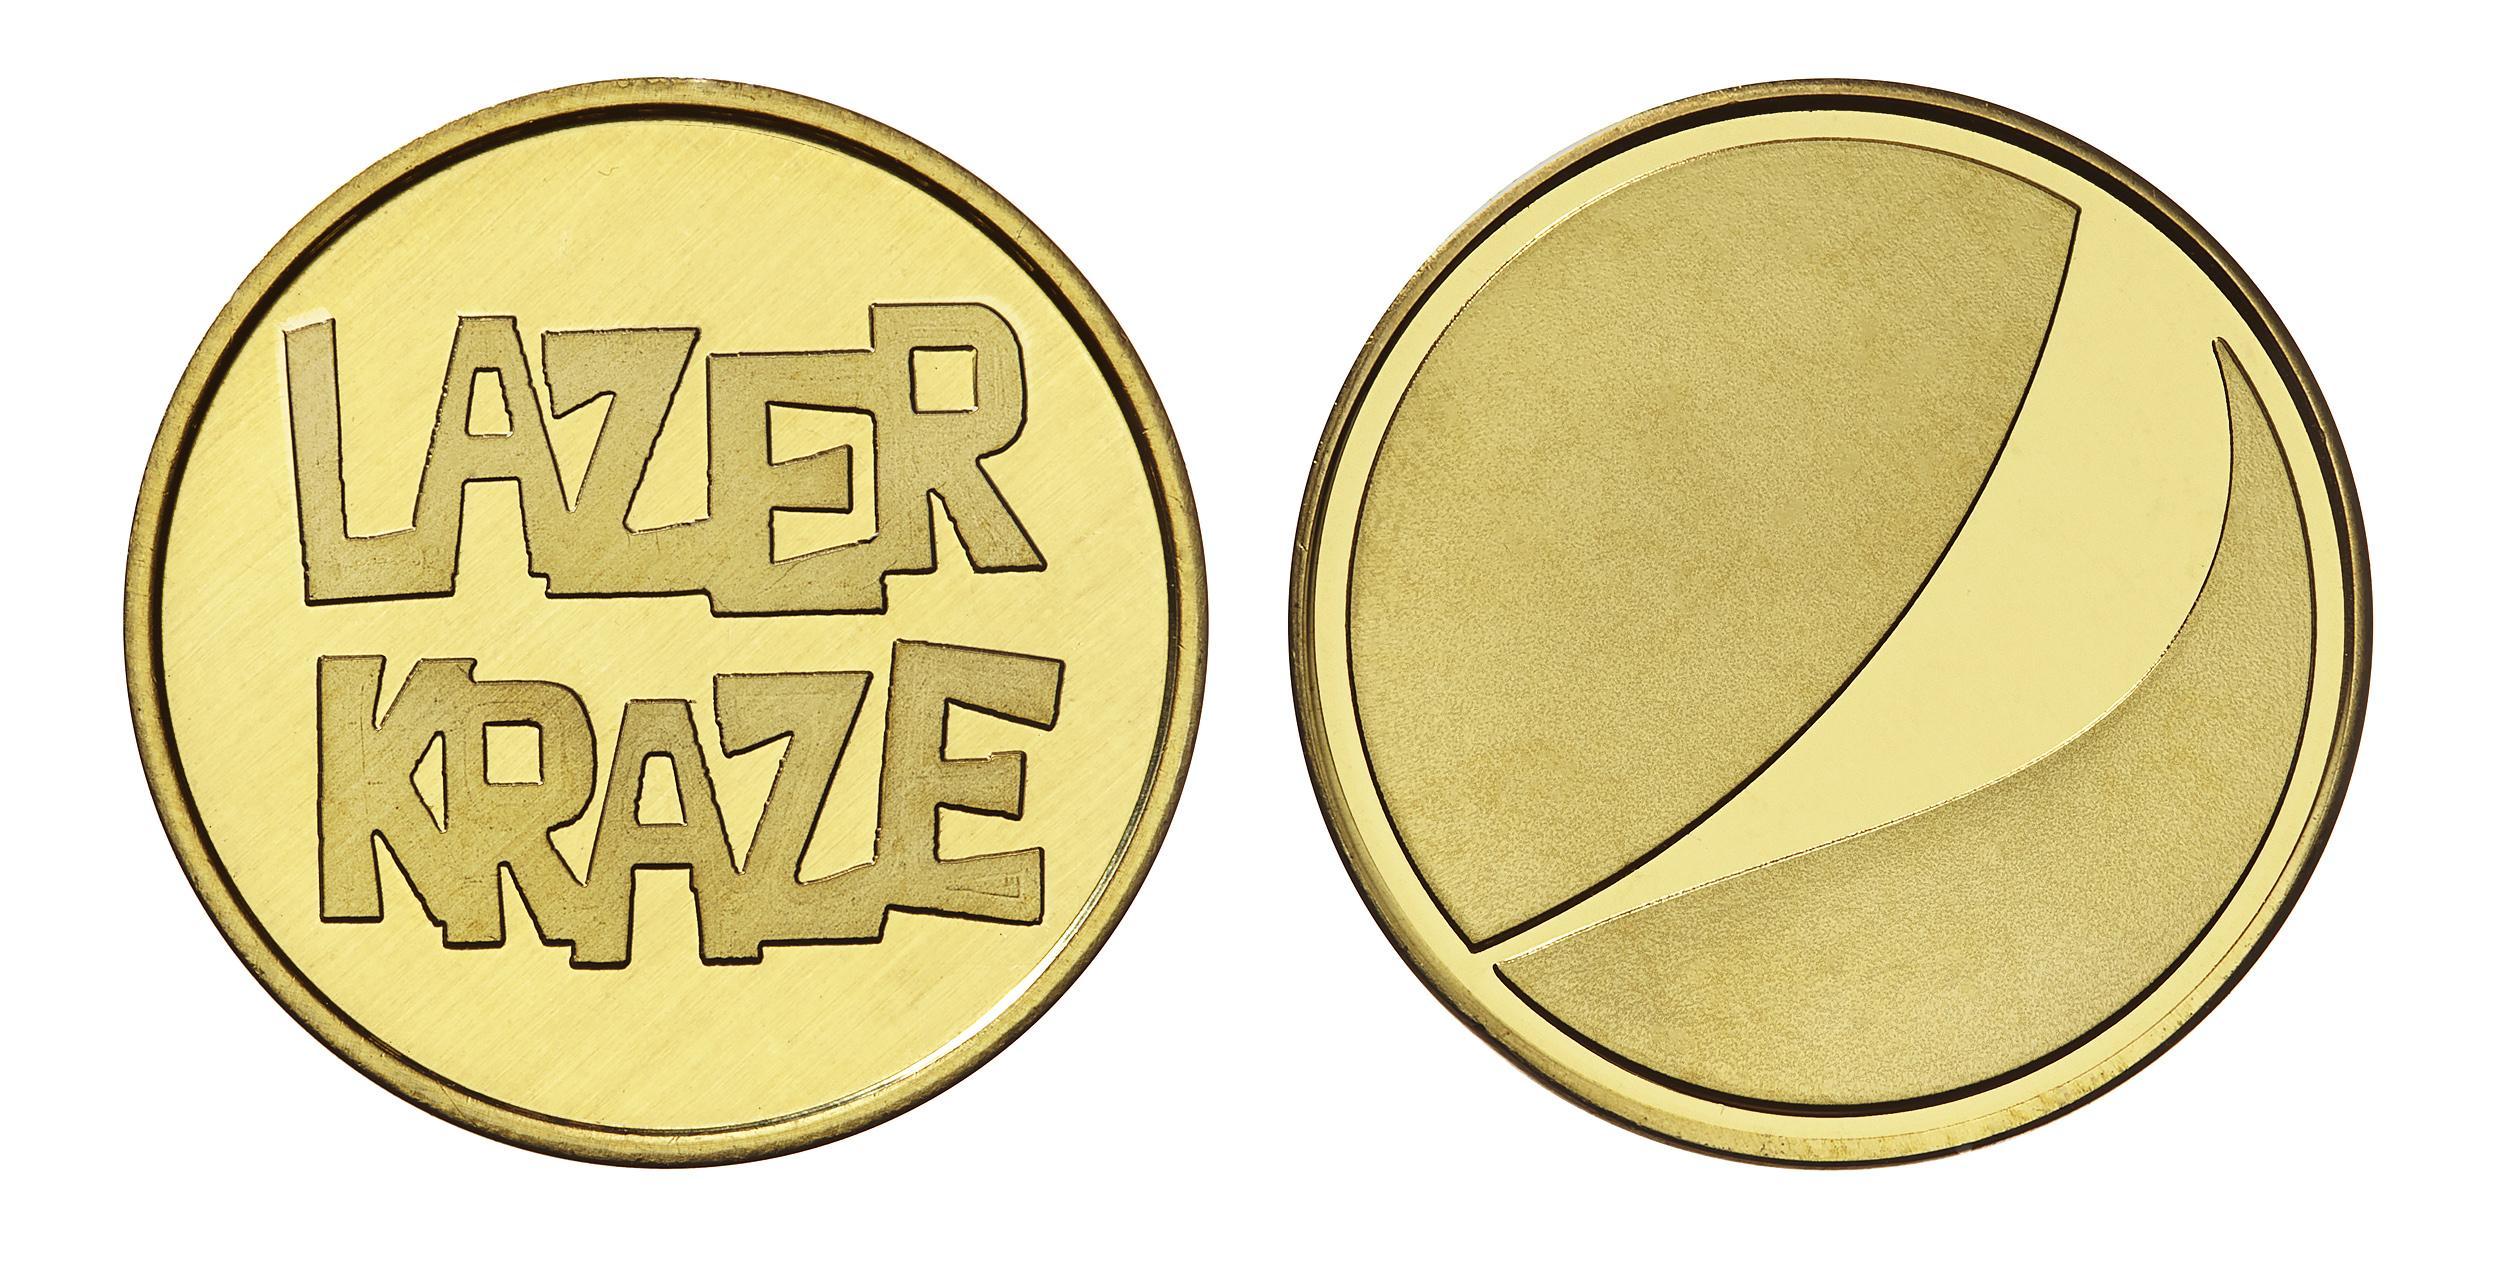 Lazer Kraze custom brass tokens